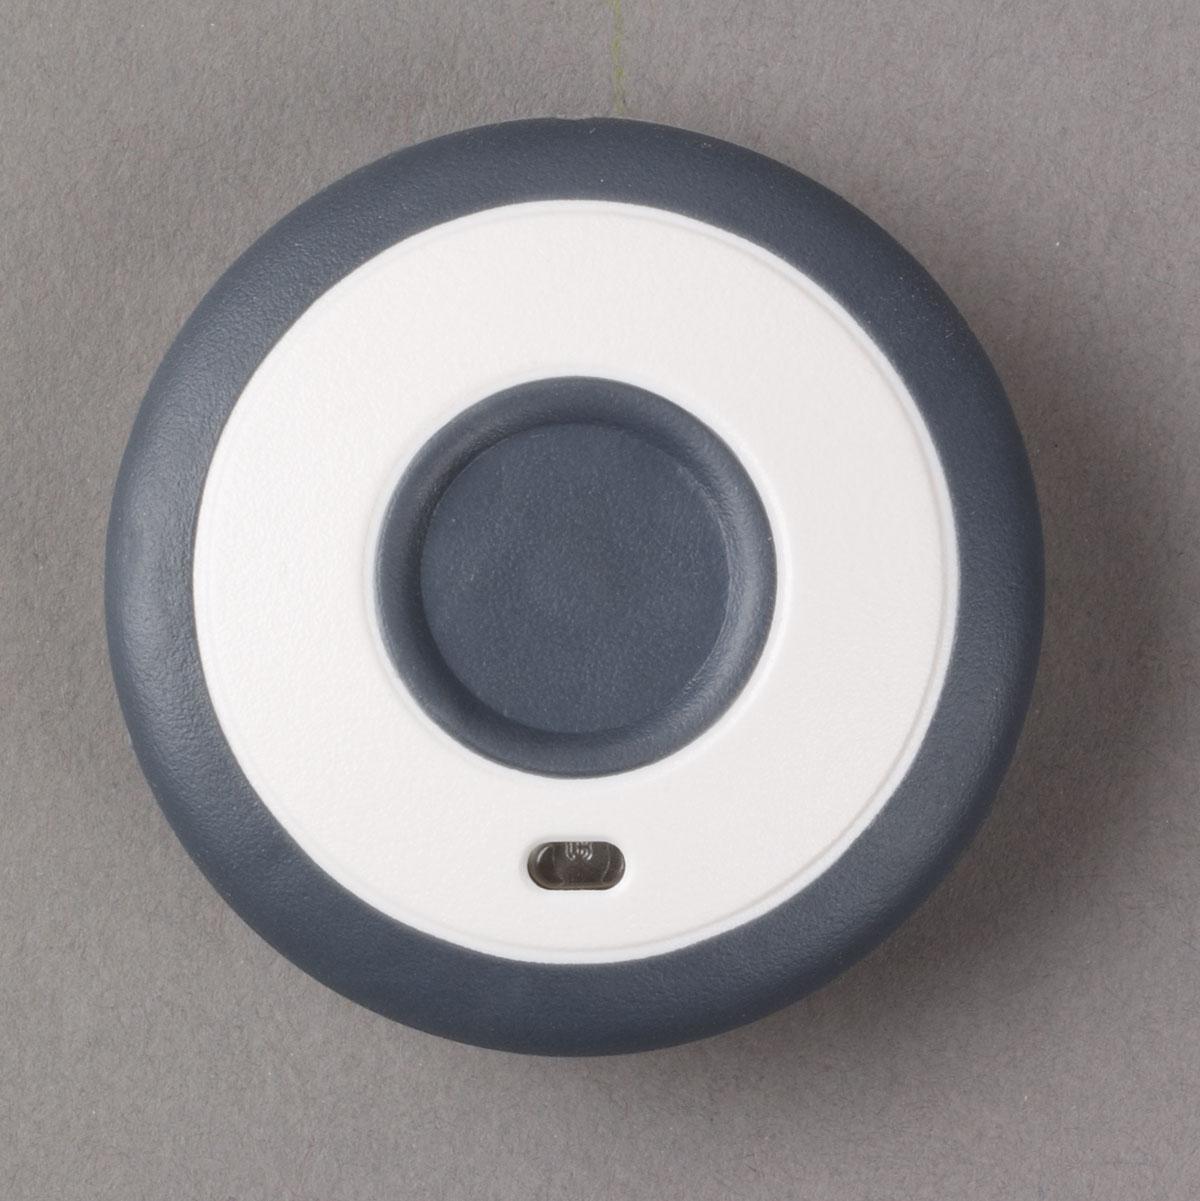 Honeywell 5802wxt 1 Button Panic Advanced Security Llc